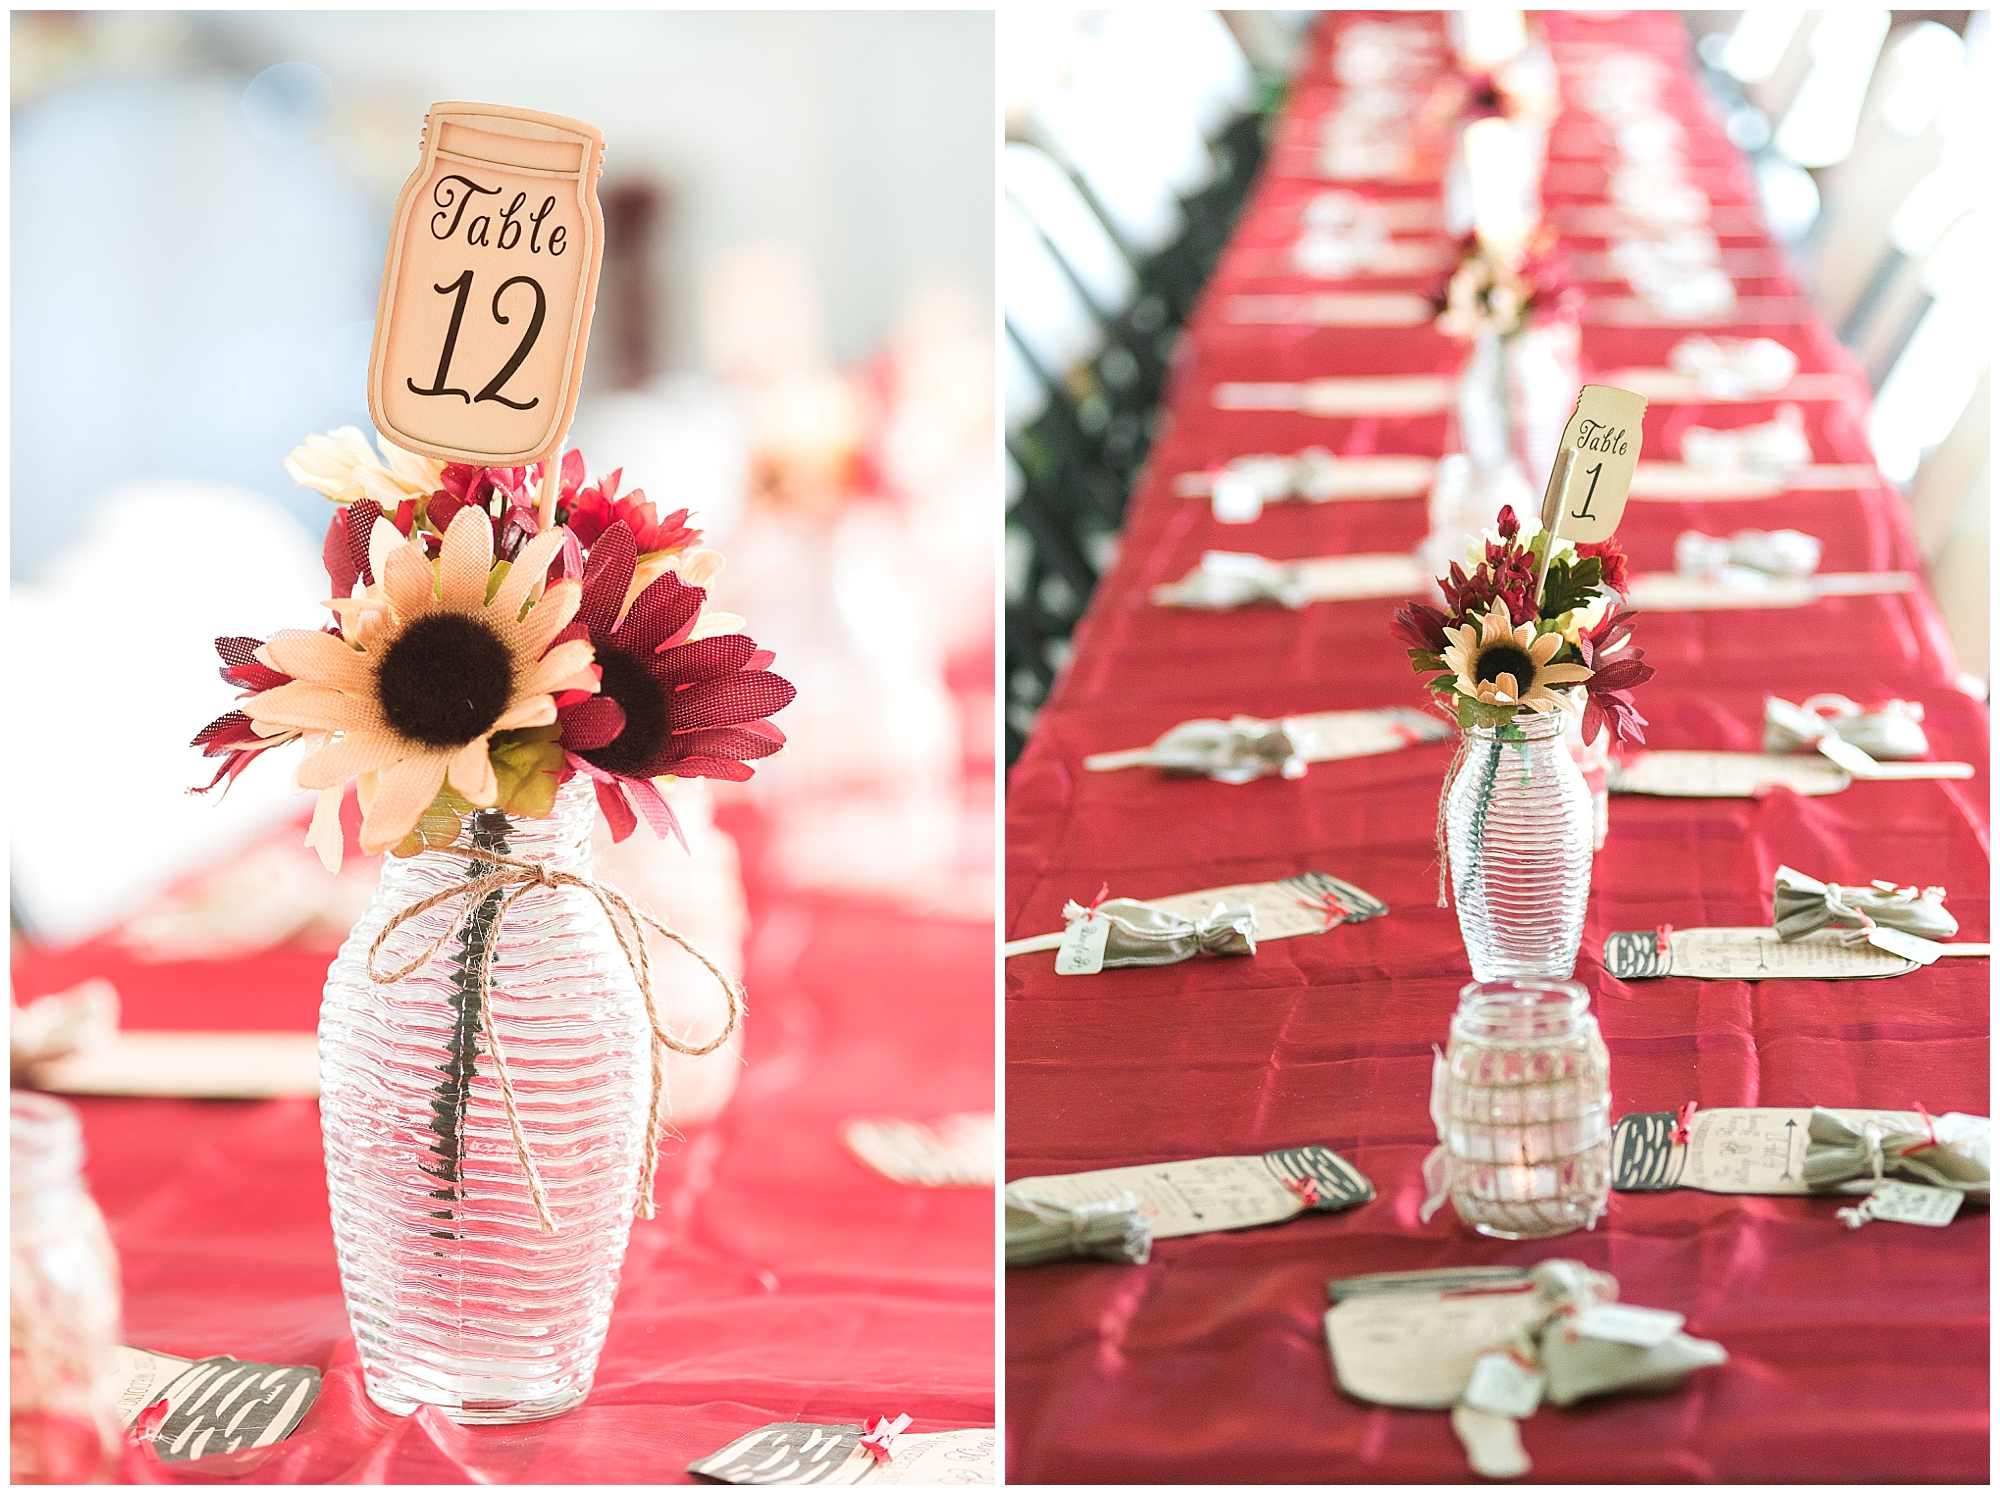 country-rustic-wedding-reception-decor